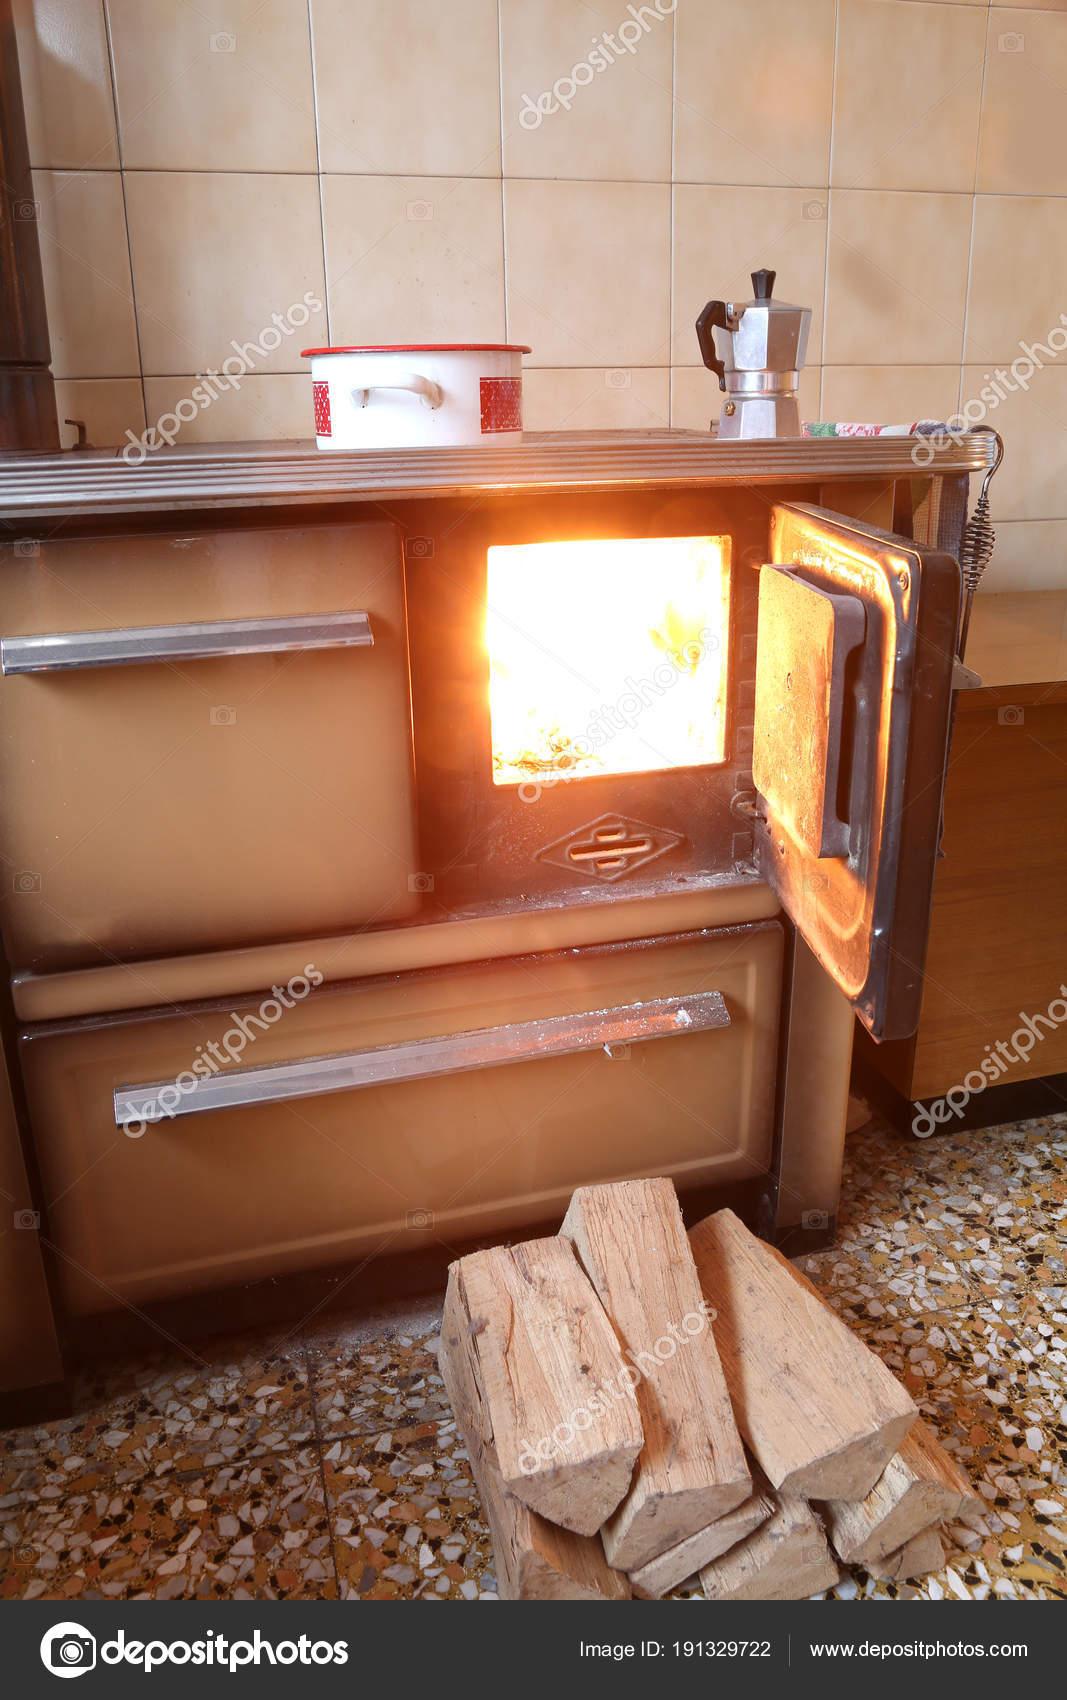 Vecchia stufa in cucina di una capanna di montagna — Foto Stock ...